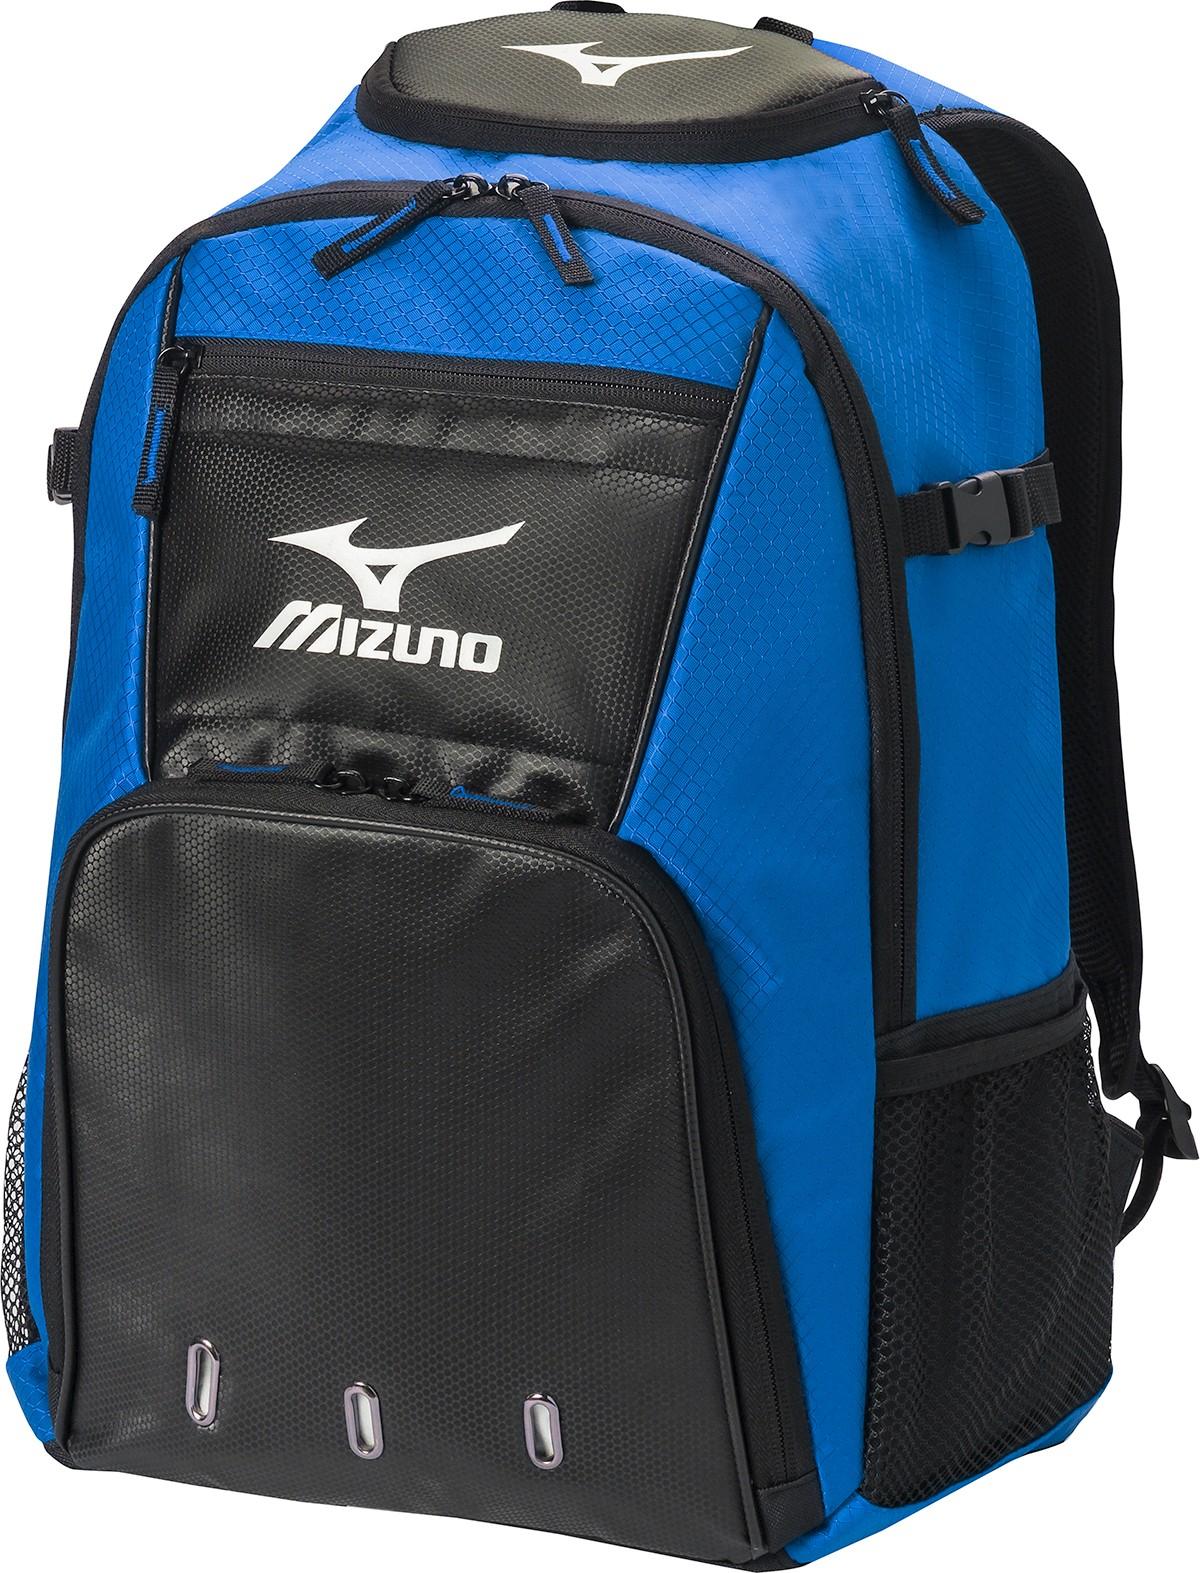 Mizuno Organizer G4 Batpack, 360226, 18